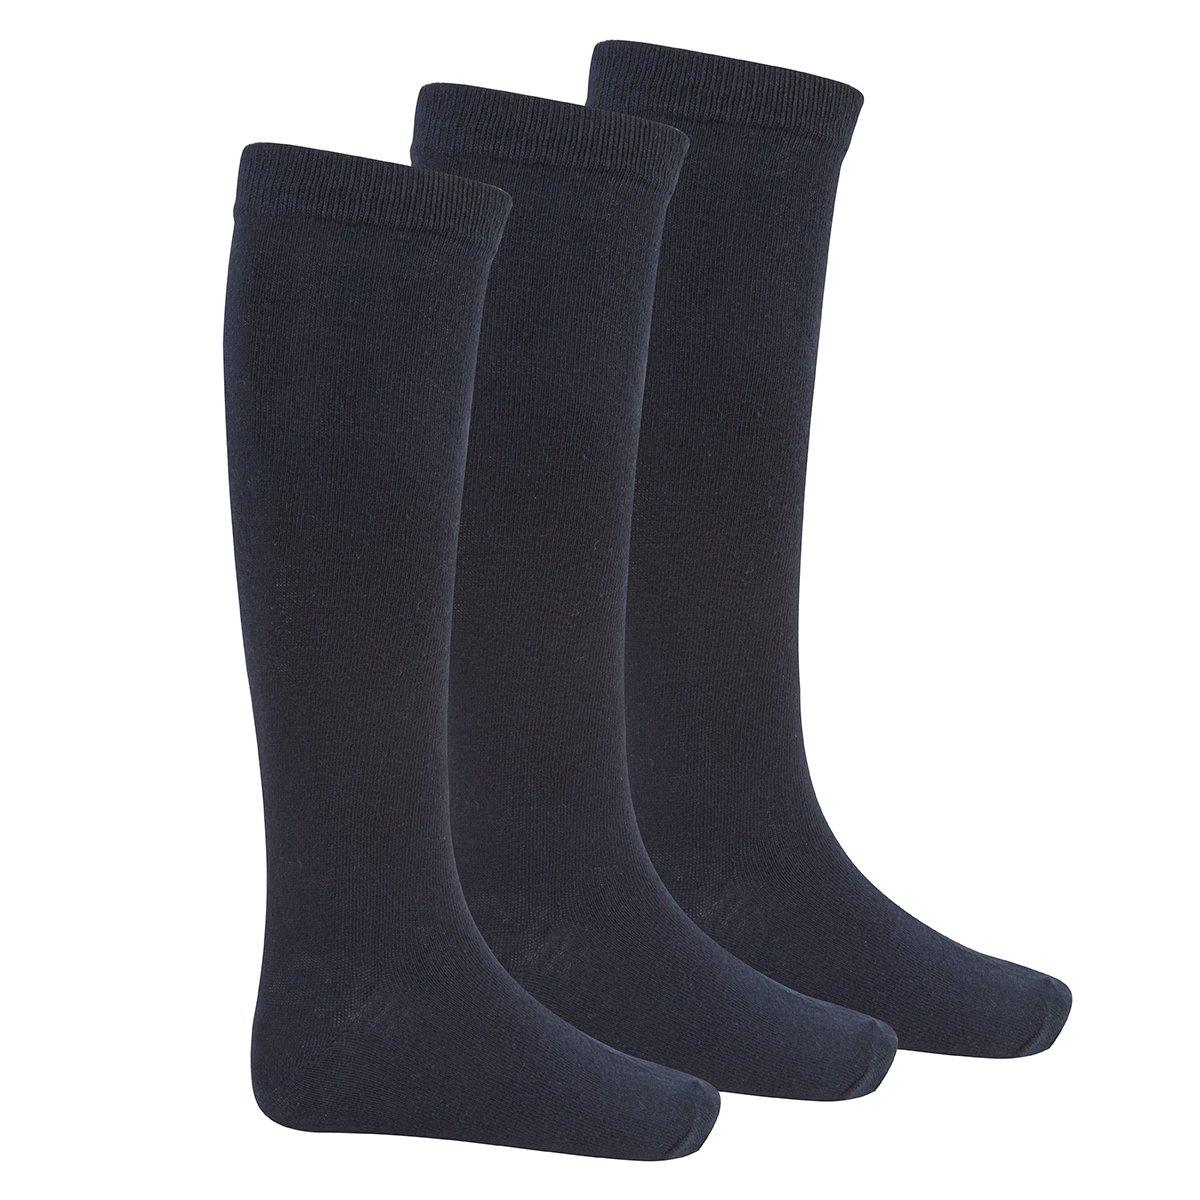 Bay 6 Kids Plain Cotton Rich Knee High School Socks